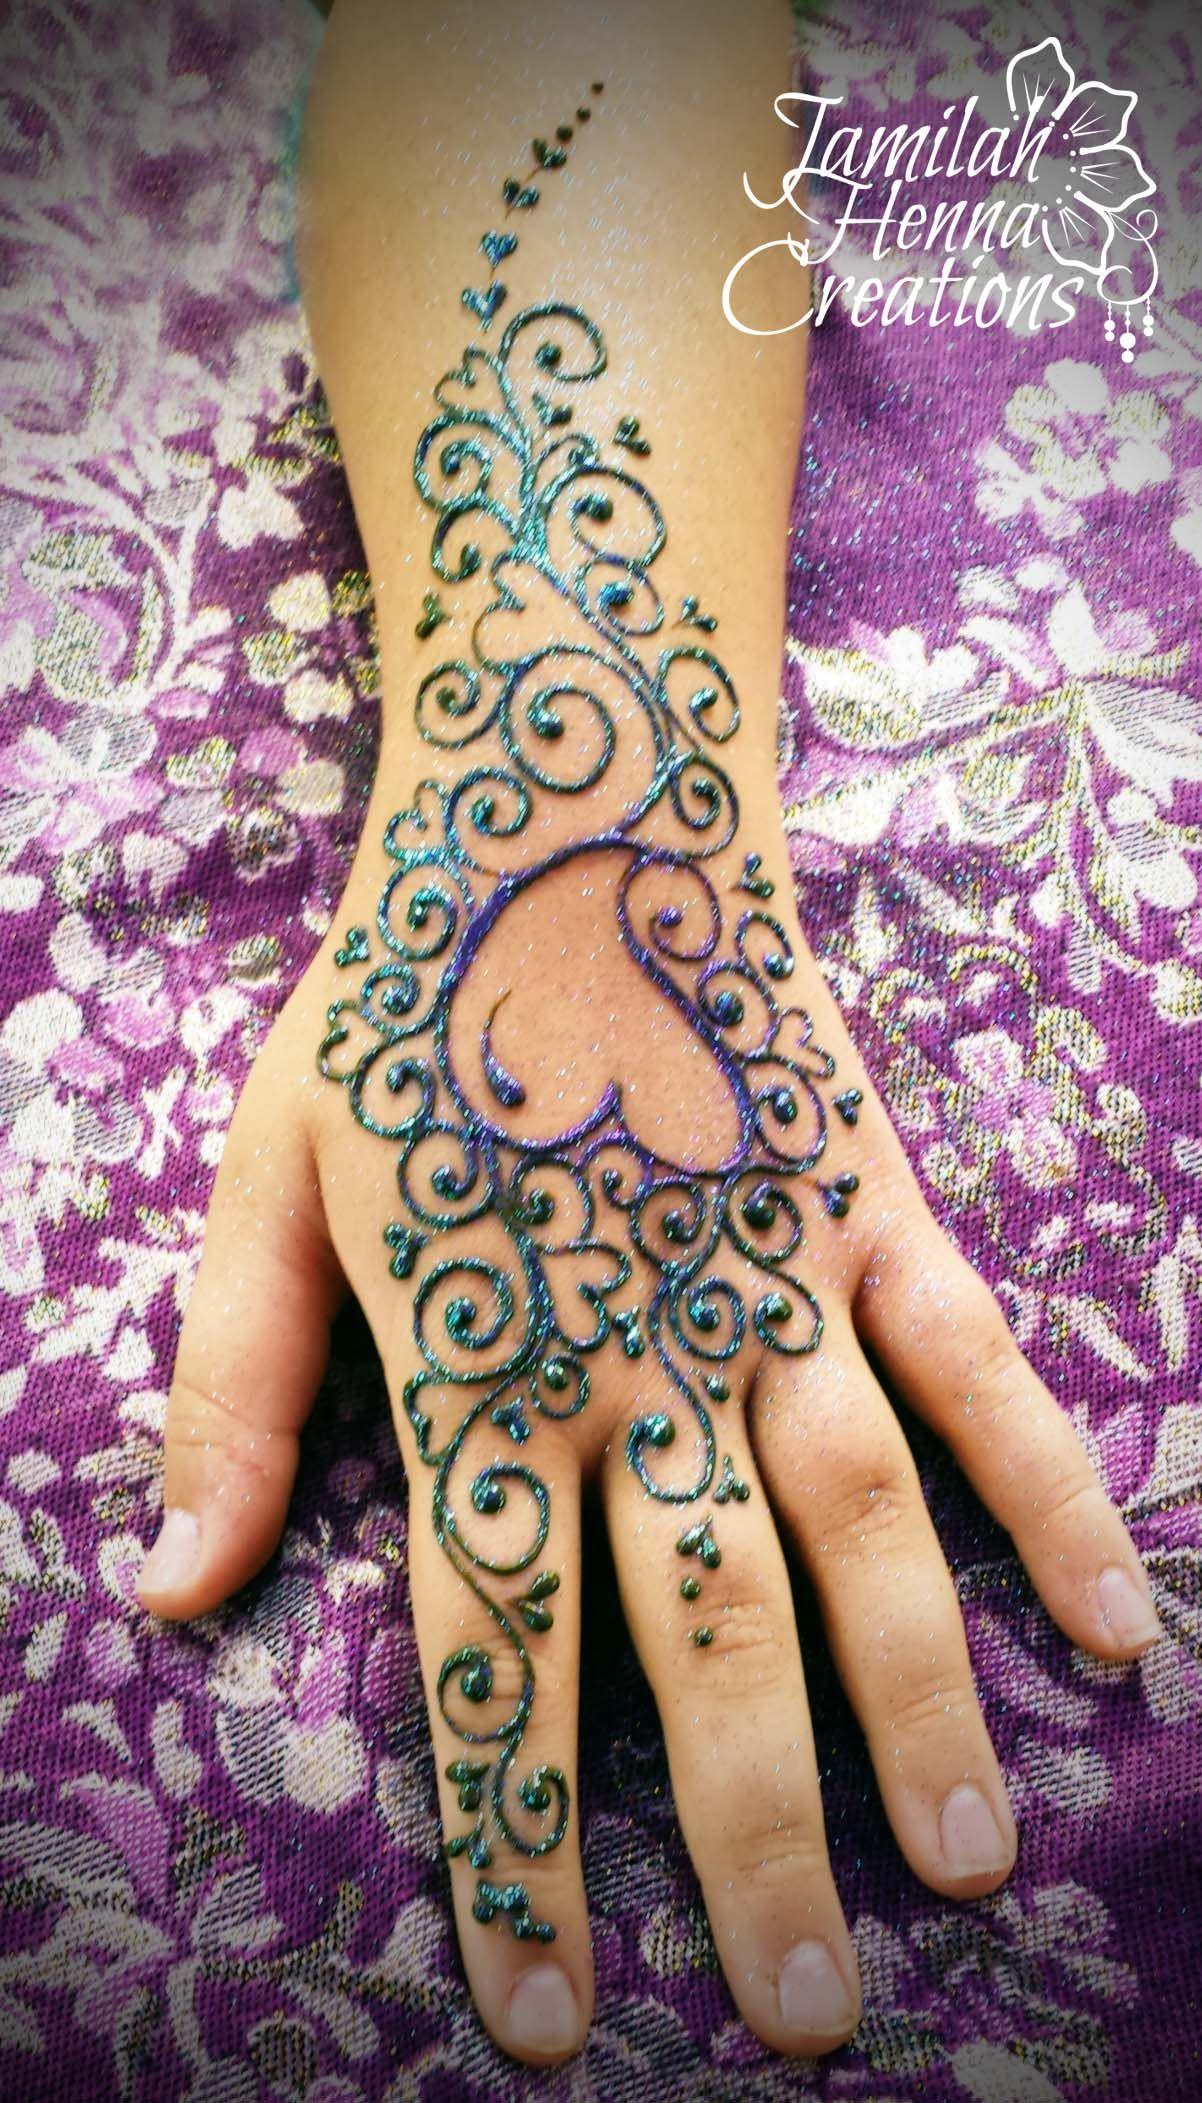 Simple Henna Tattoo Designs Hearts: Www.jamilahhennacreations.com Hearts Hearts Hearts Henna